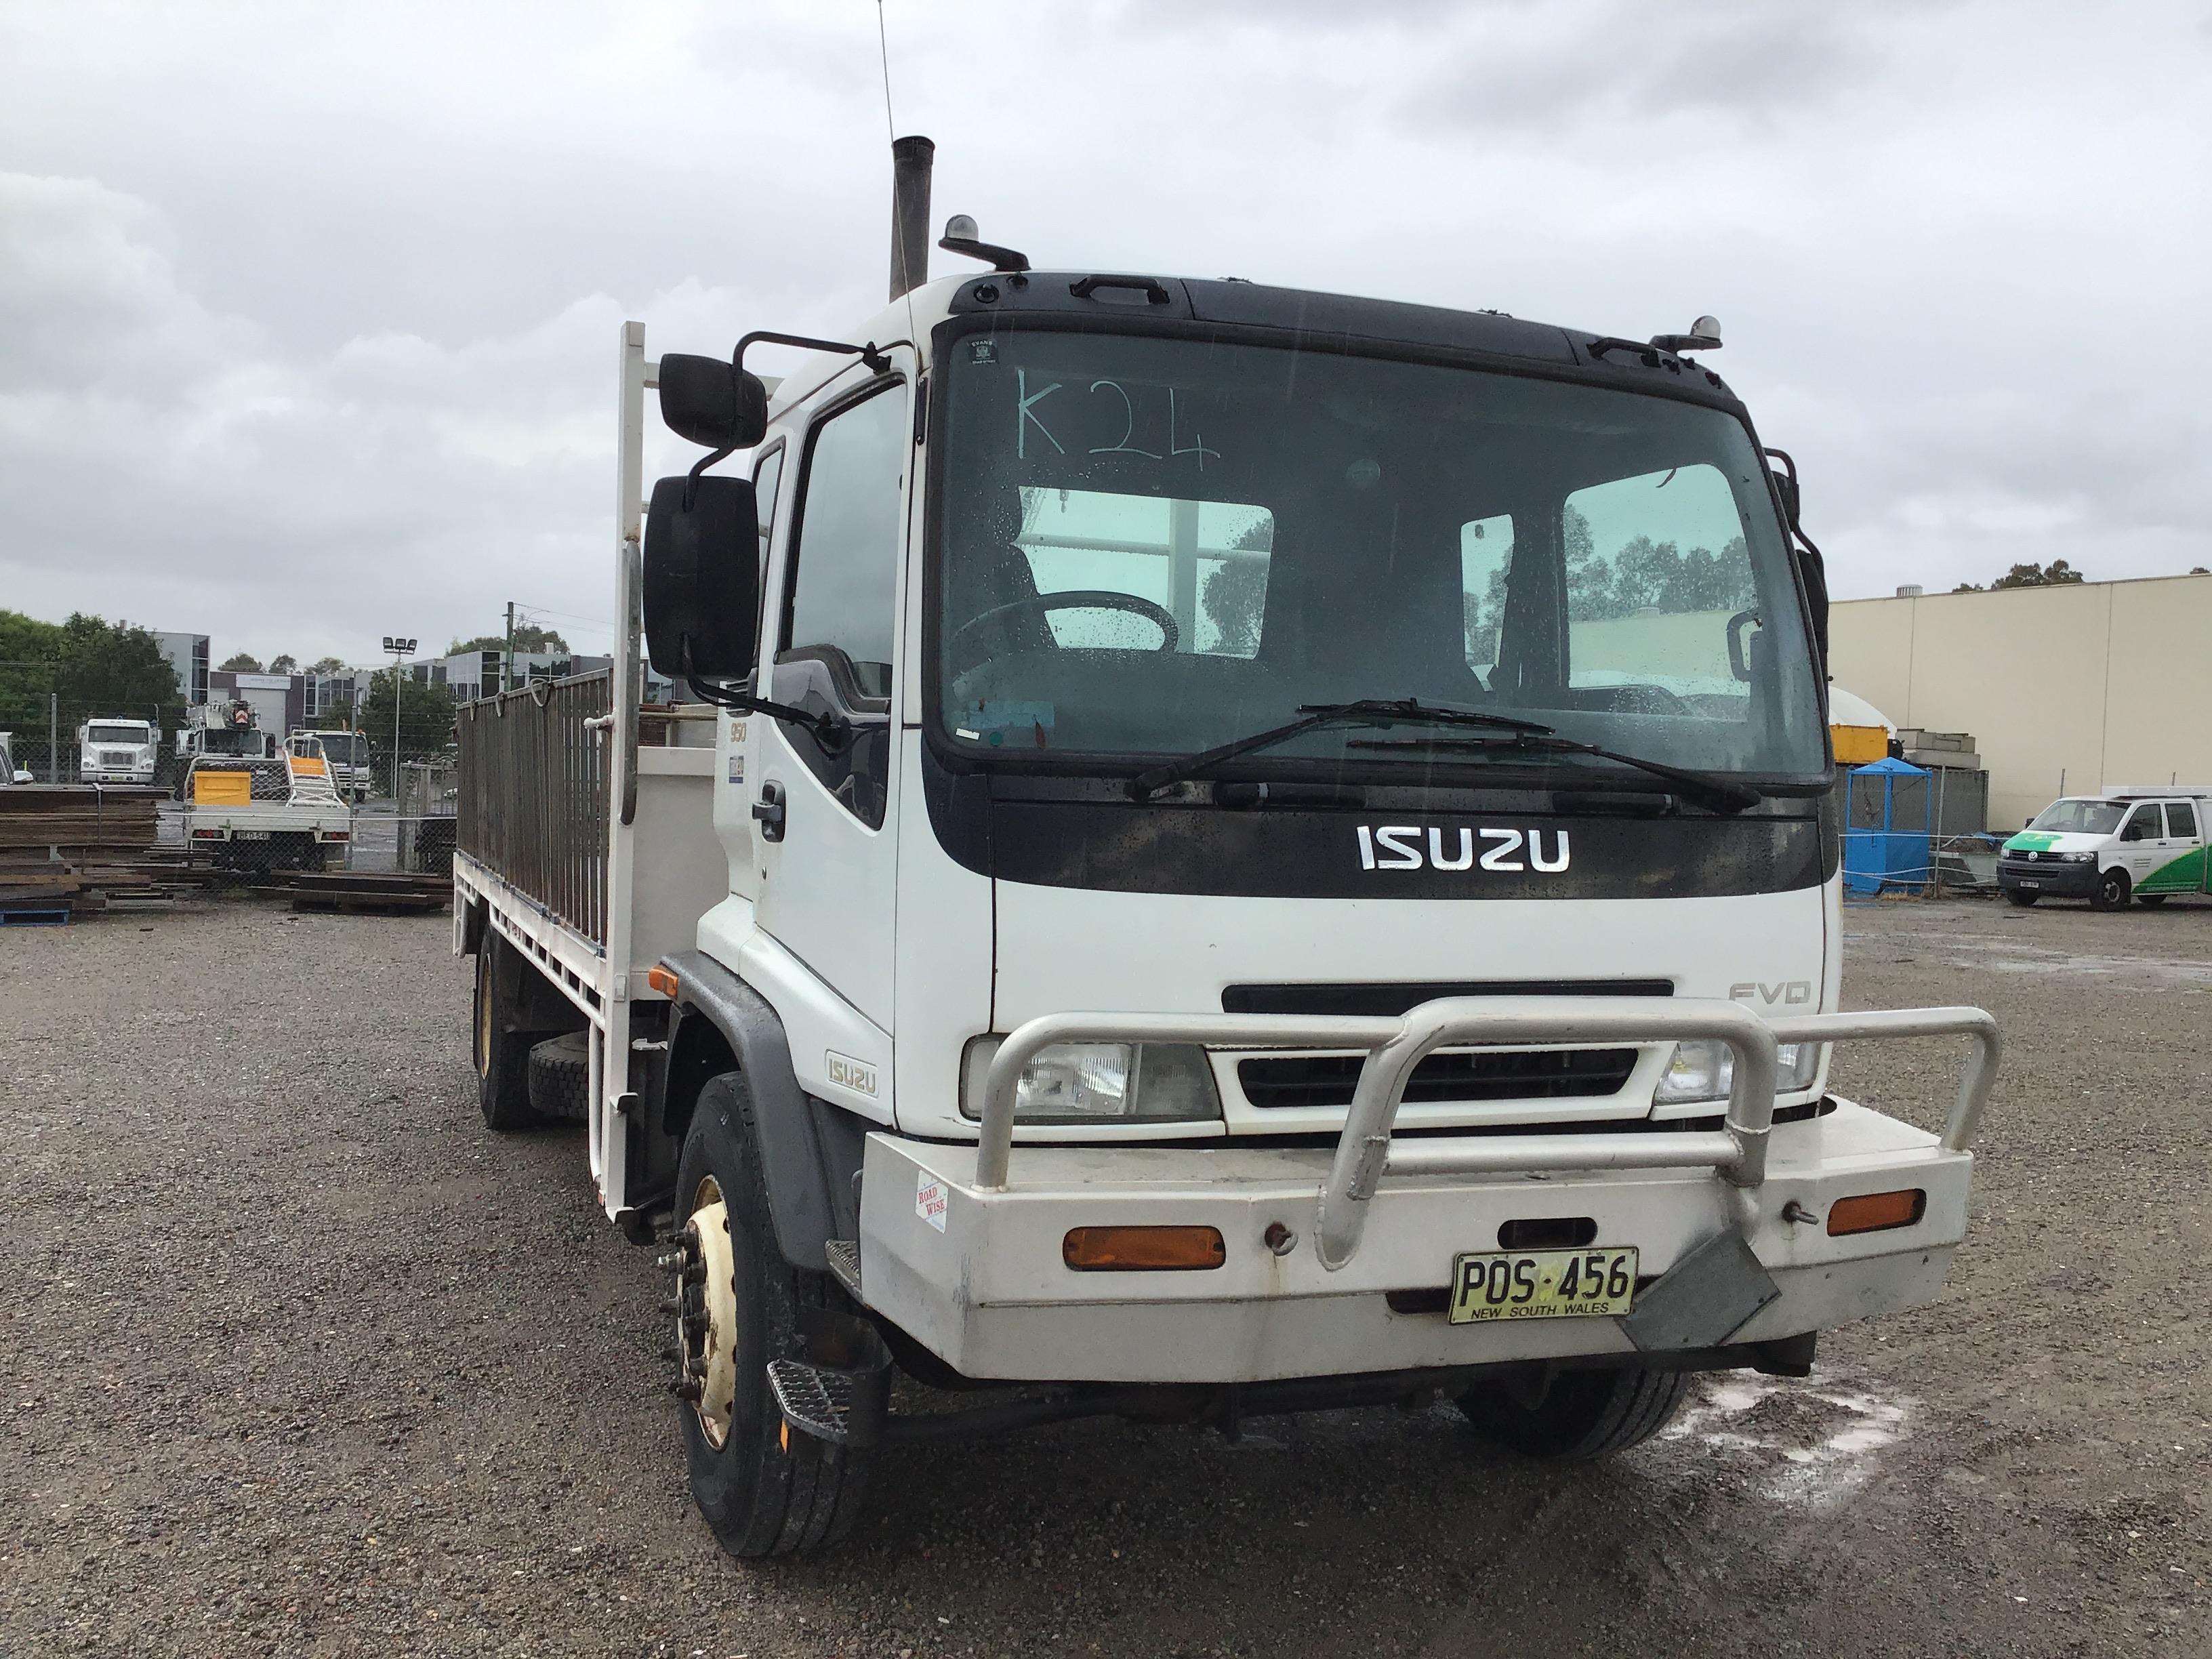 2001 ISUZU FVD950 Sitec 295 4 x 2 Tray Body Truck